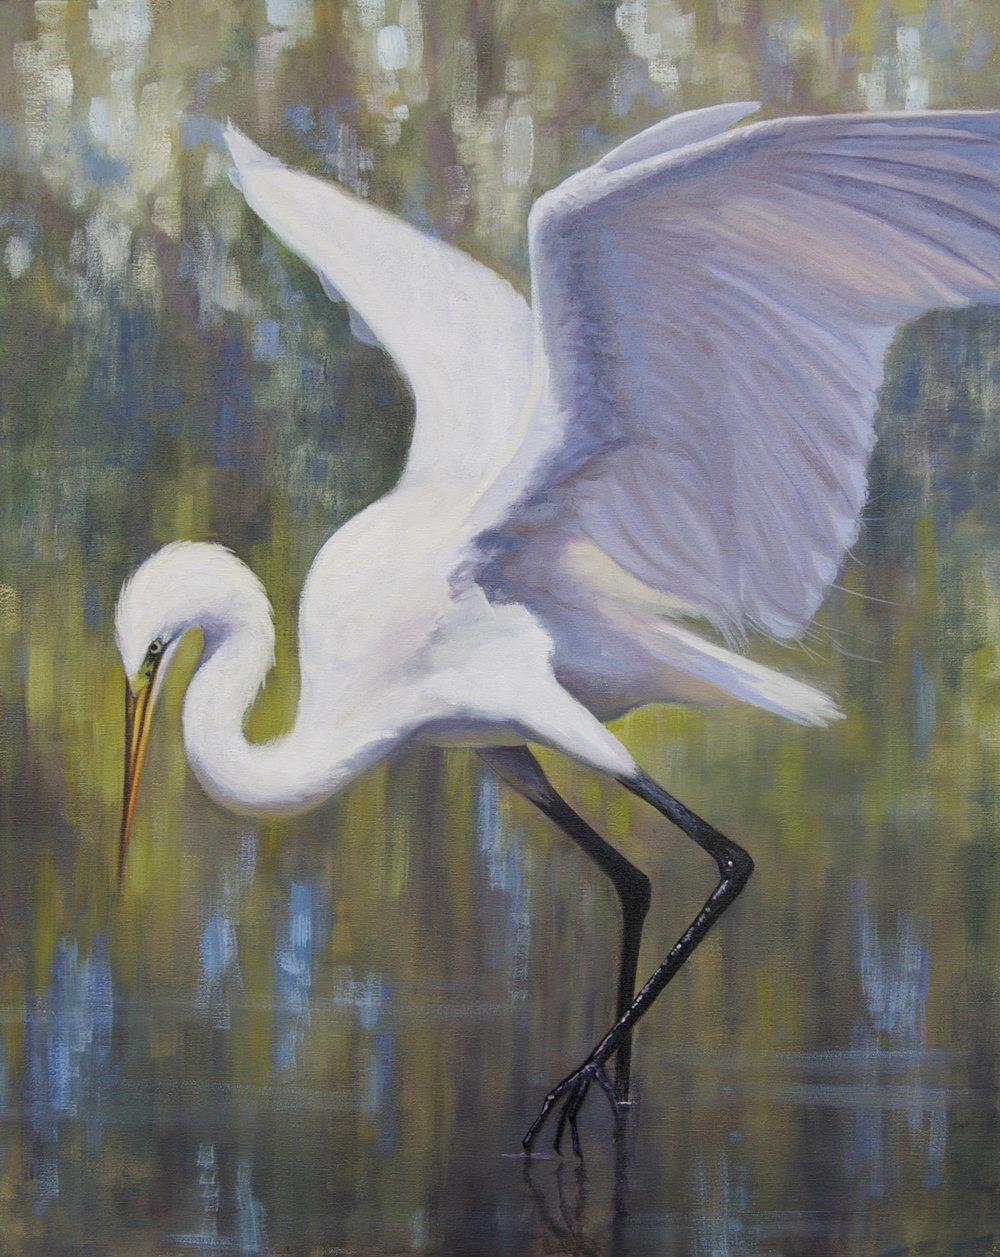 "Holly Glasscock,Egret Dance, 2017, oil on board, 24"" x 30"""